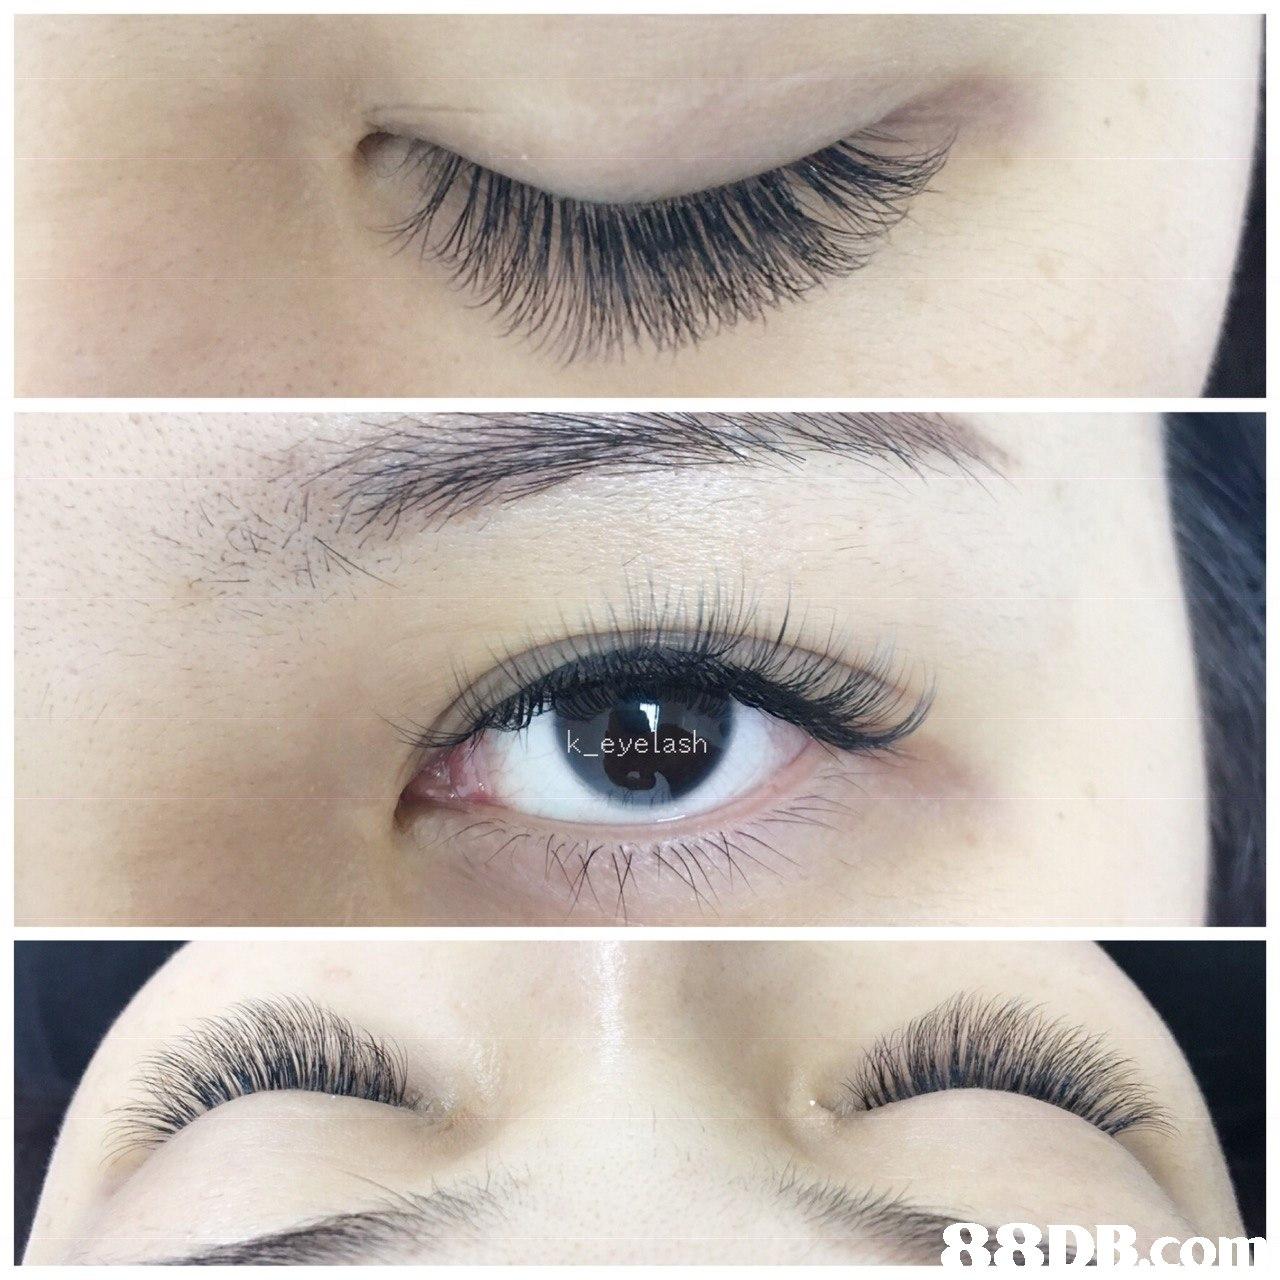 k_eyelash  eyebrow,eyelash,cosmetics,eye,eye shadow